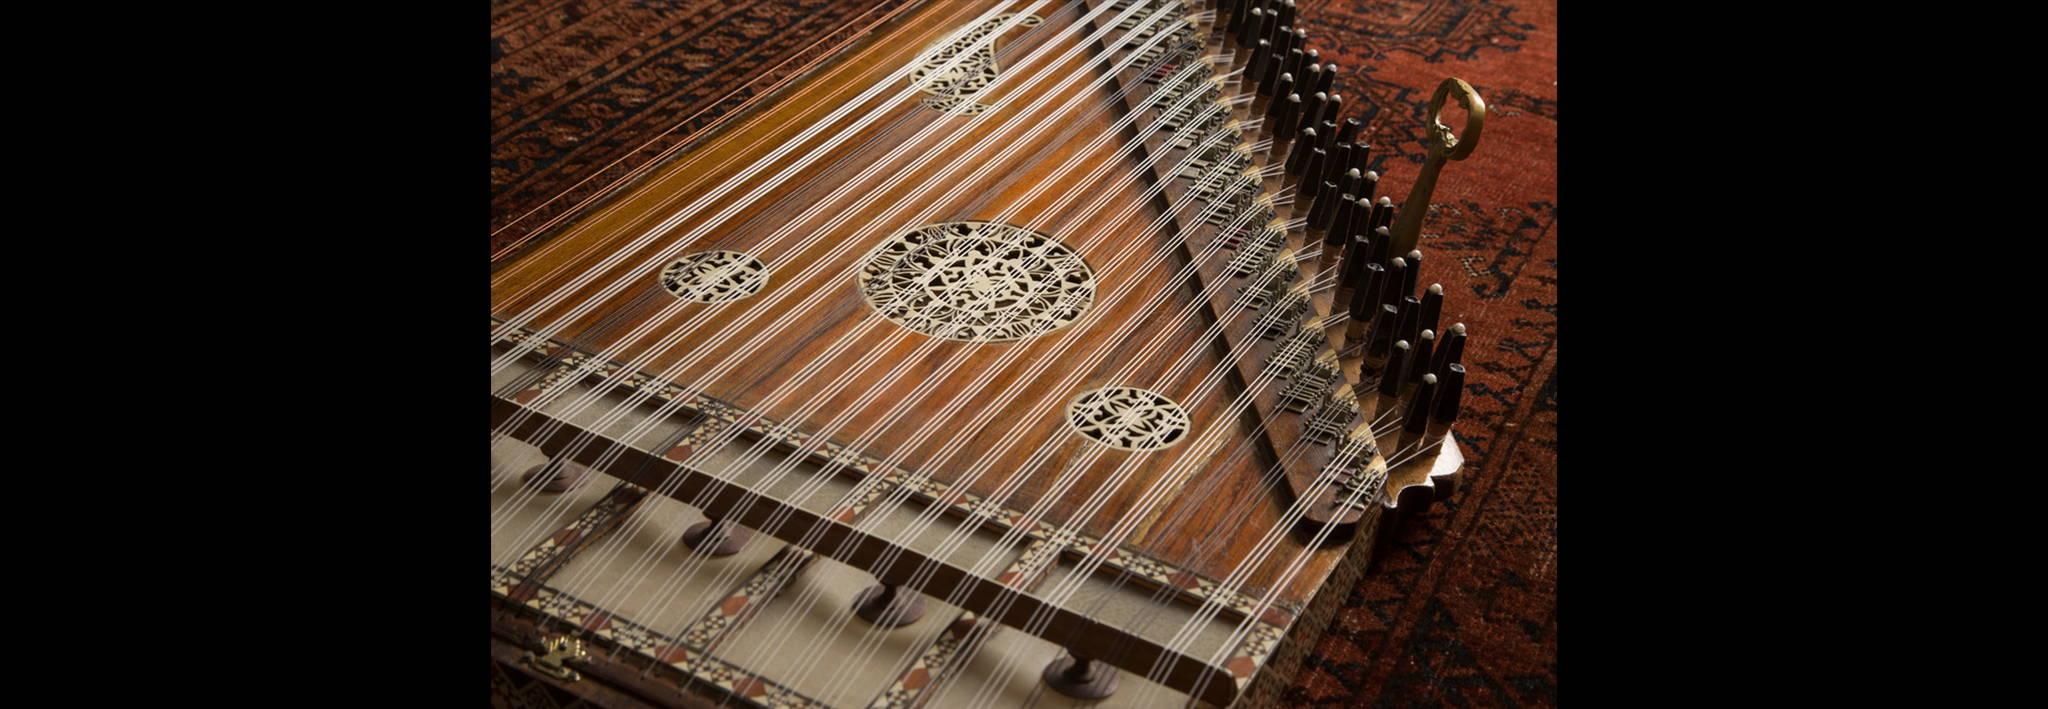 Qanun – Malik Instruments Ltd